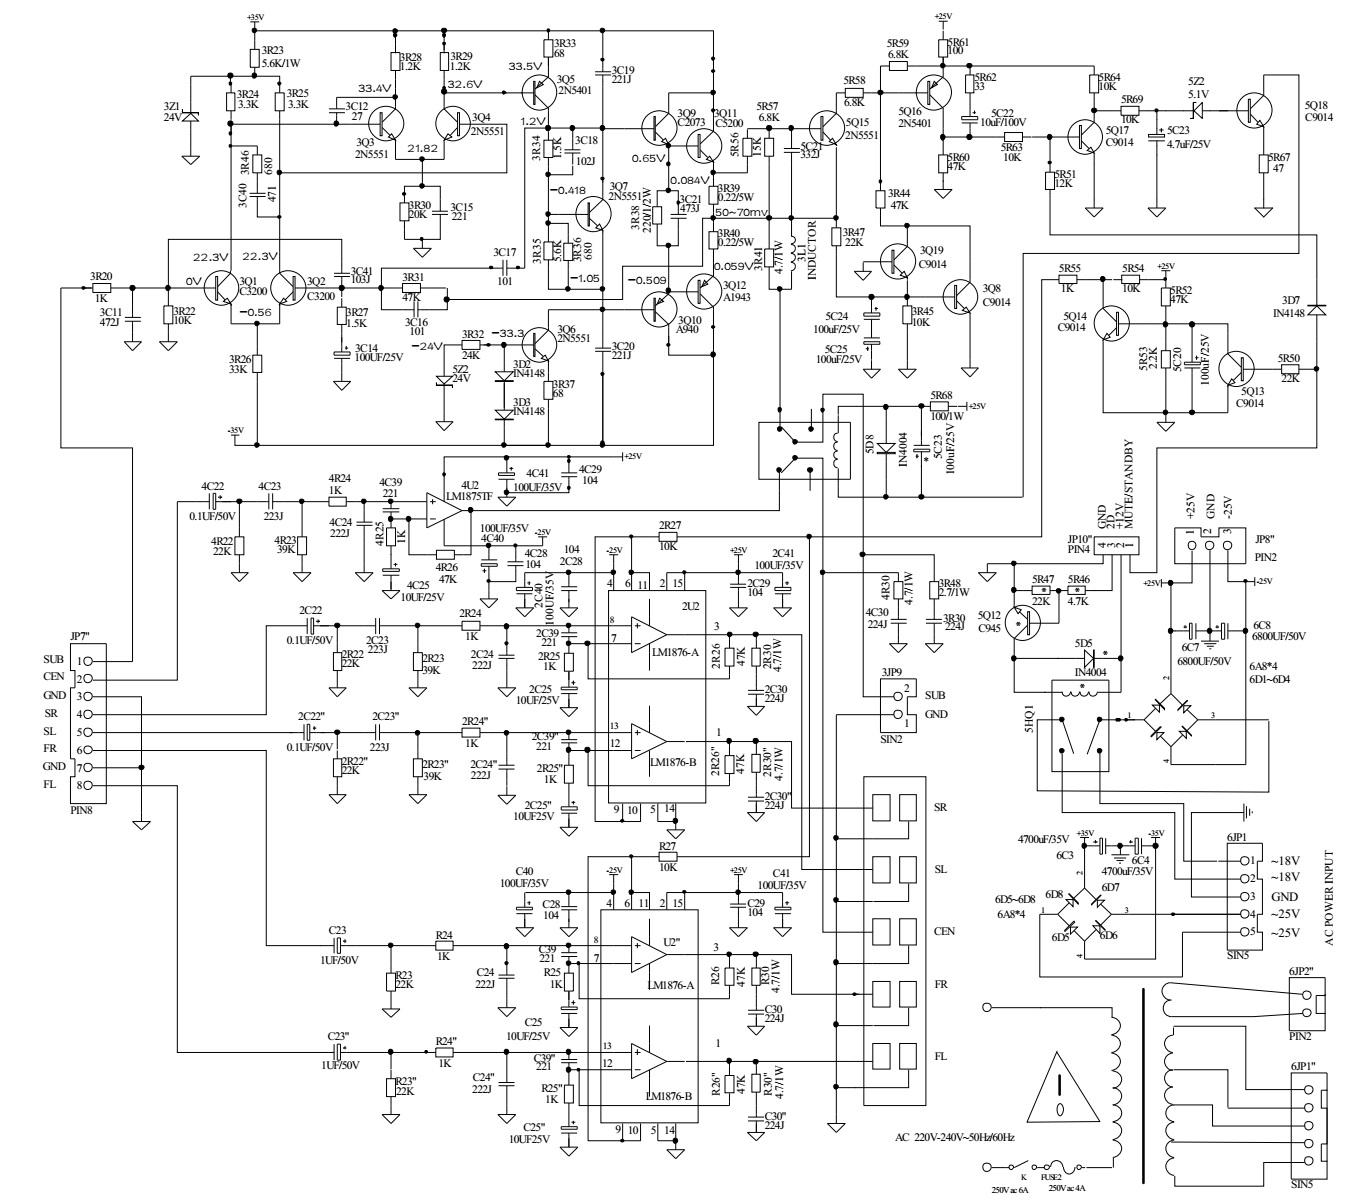 5 1 home theater circuit diagram david brown 990 wiring vivresaville subwoofer diagrams with